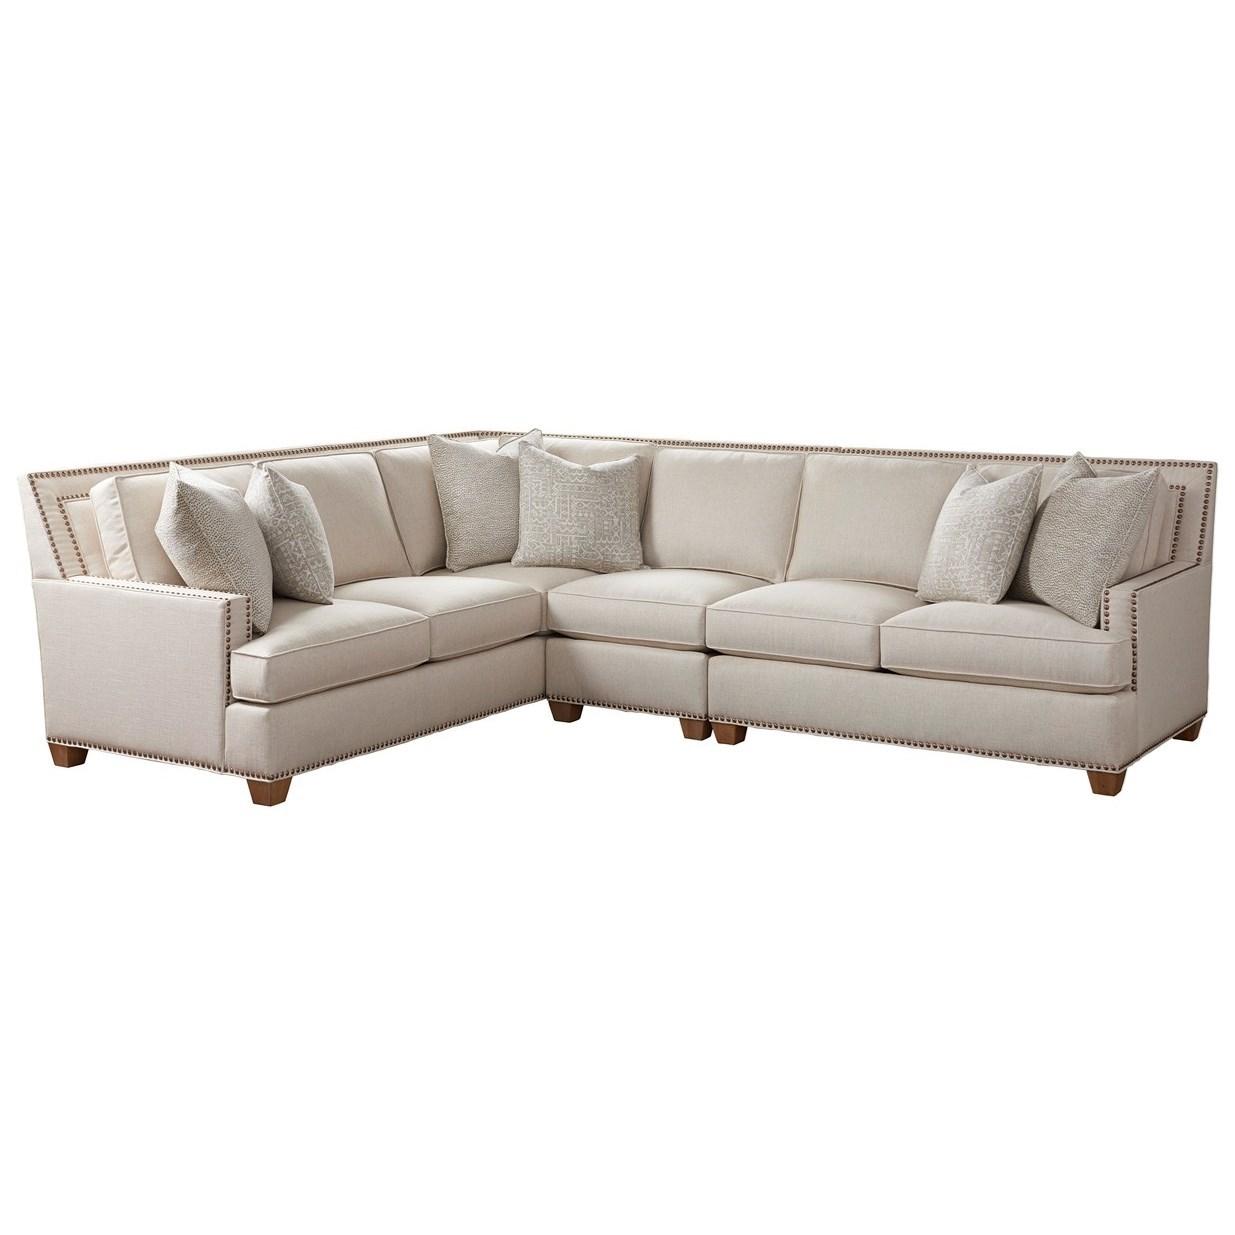 Barclay Butera Upholstery Morgan 3 Pc Sectional by Barclay Butera at Baer's Furniture